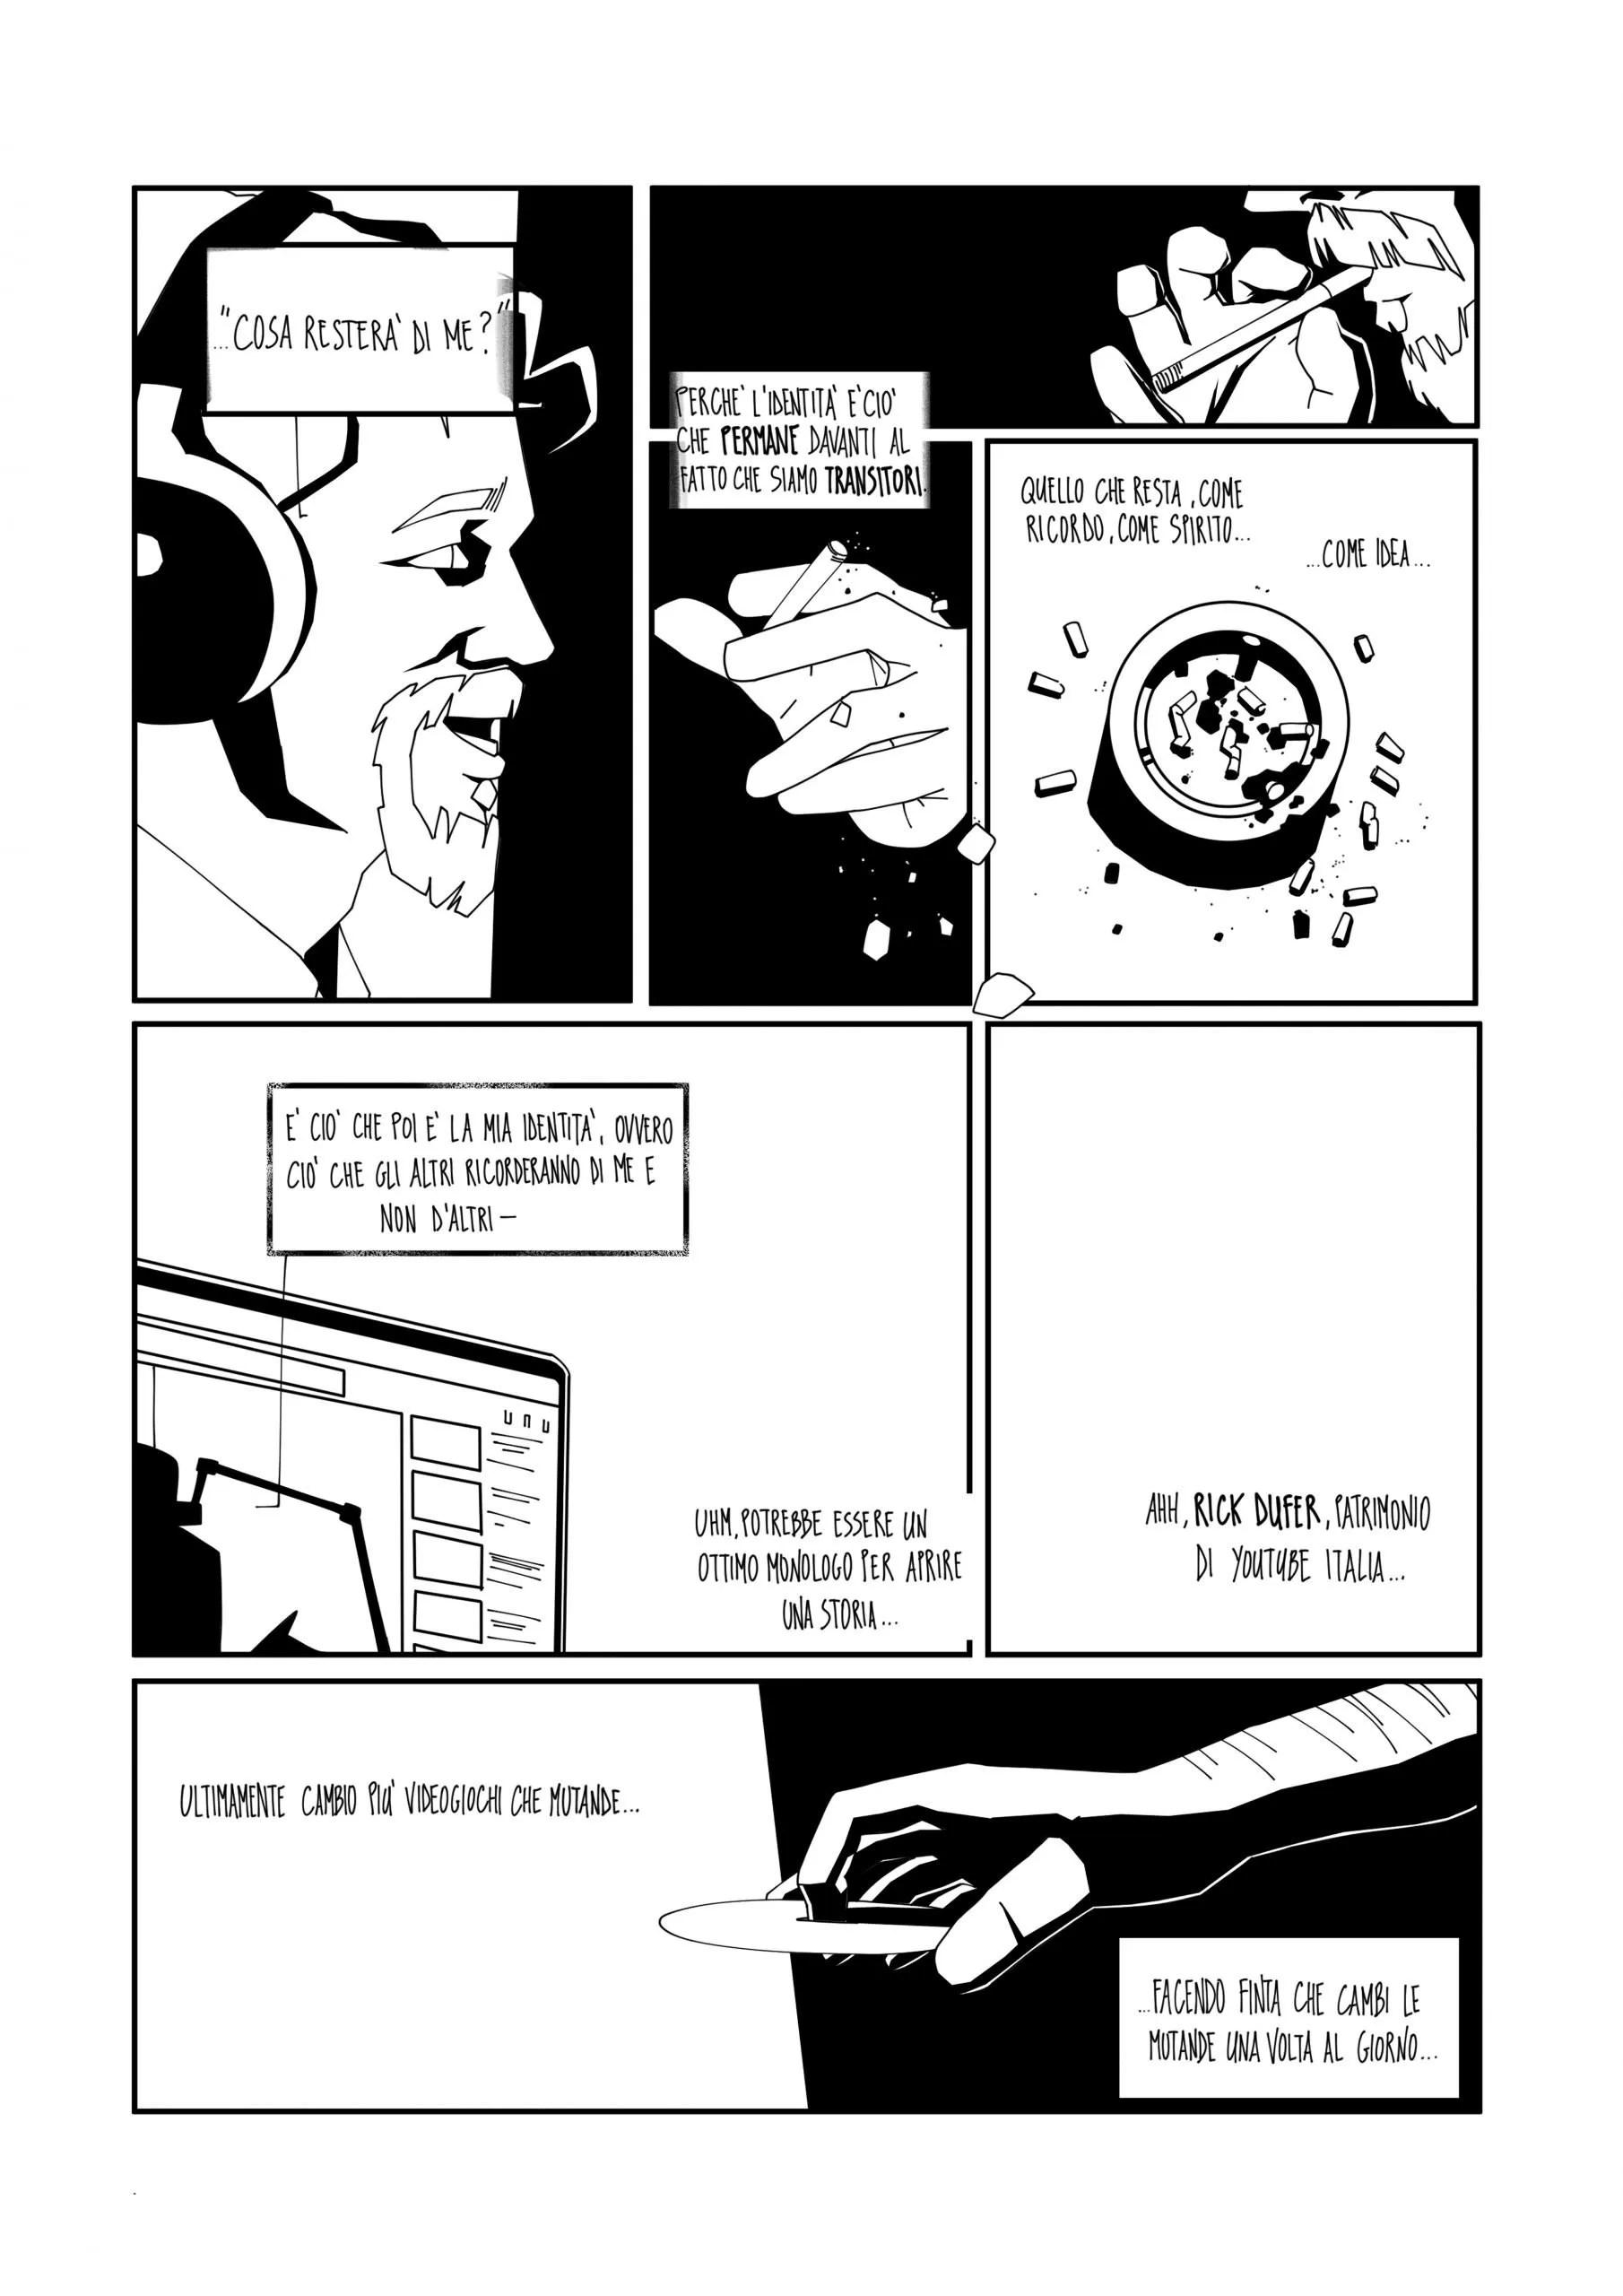 giovanni autiero spazzi dinaz.it blog a fumetti